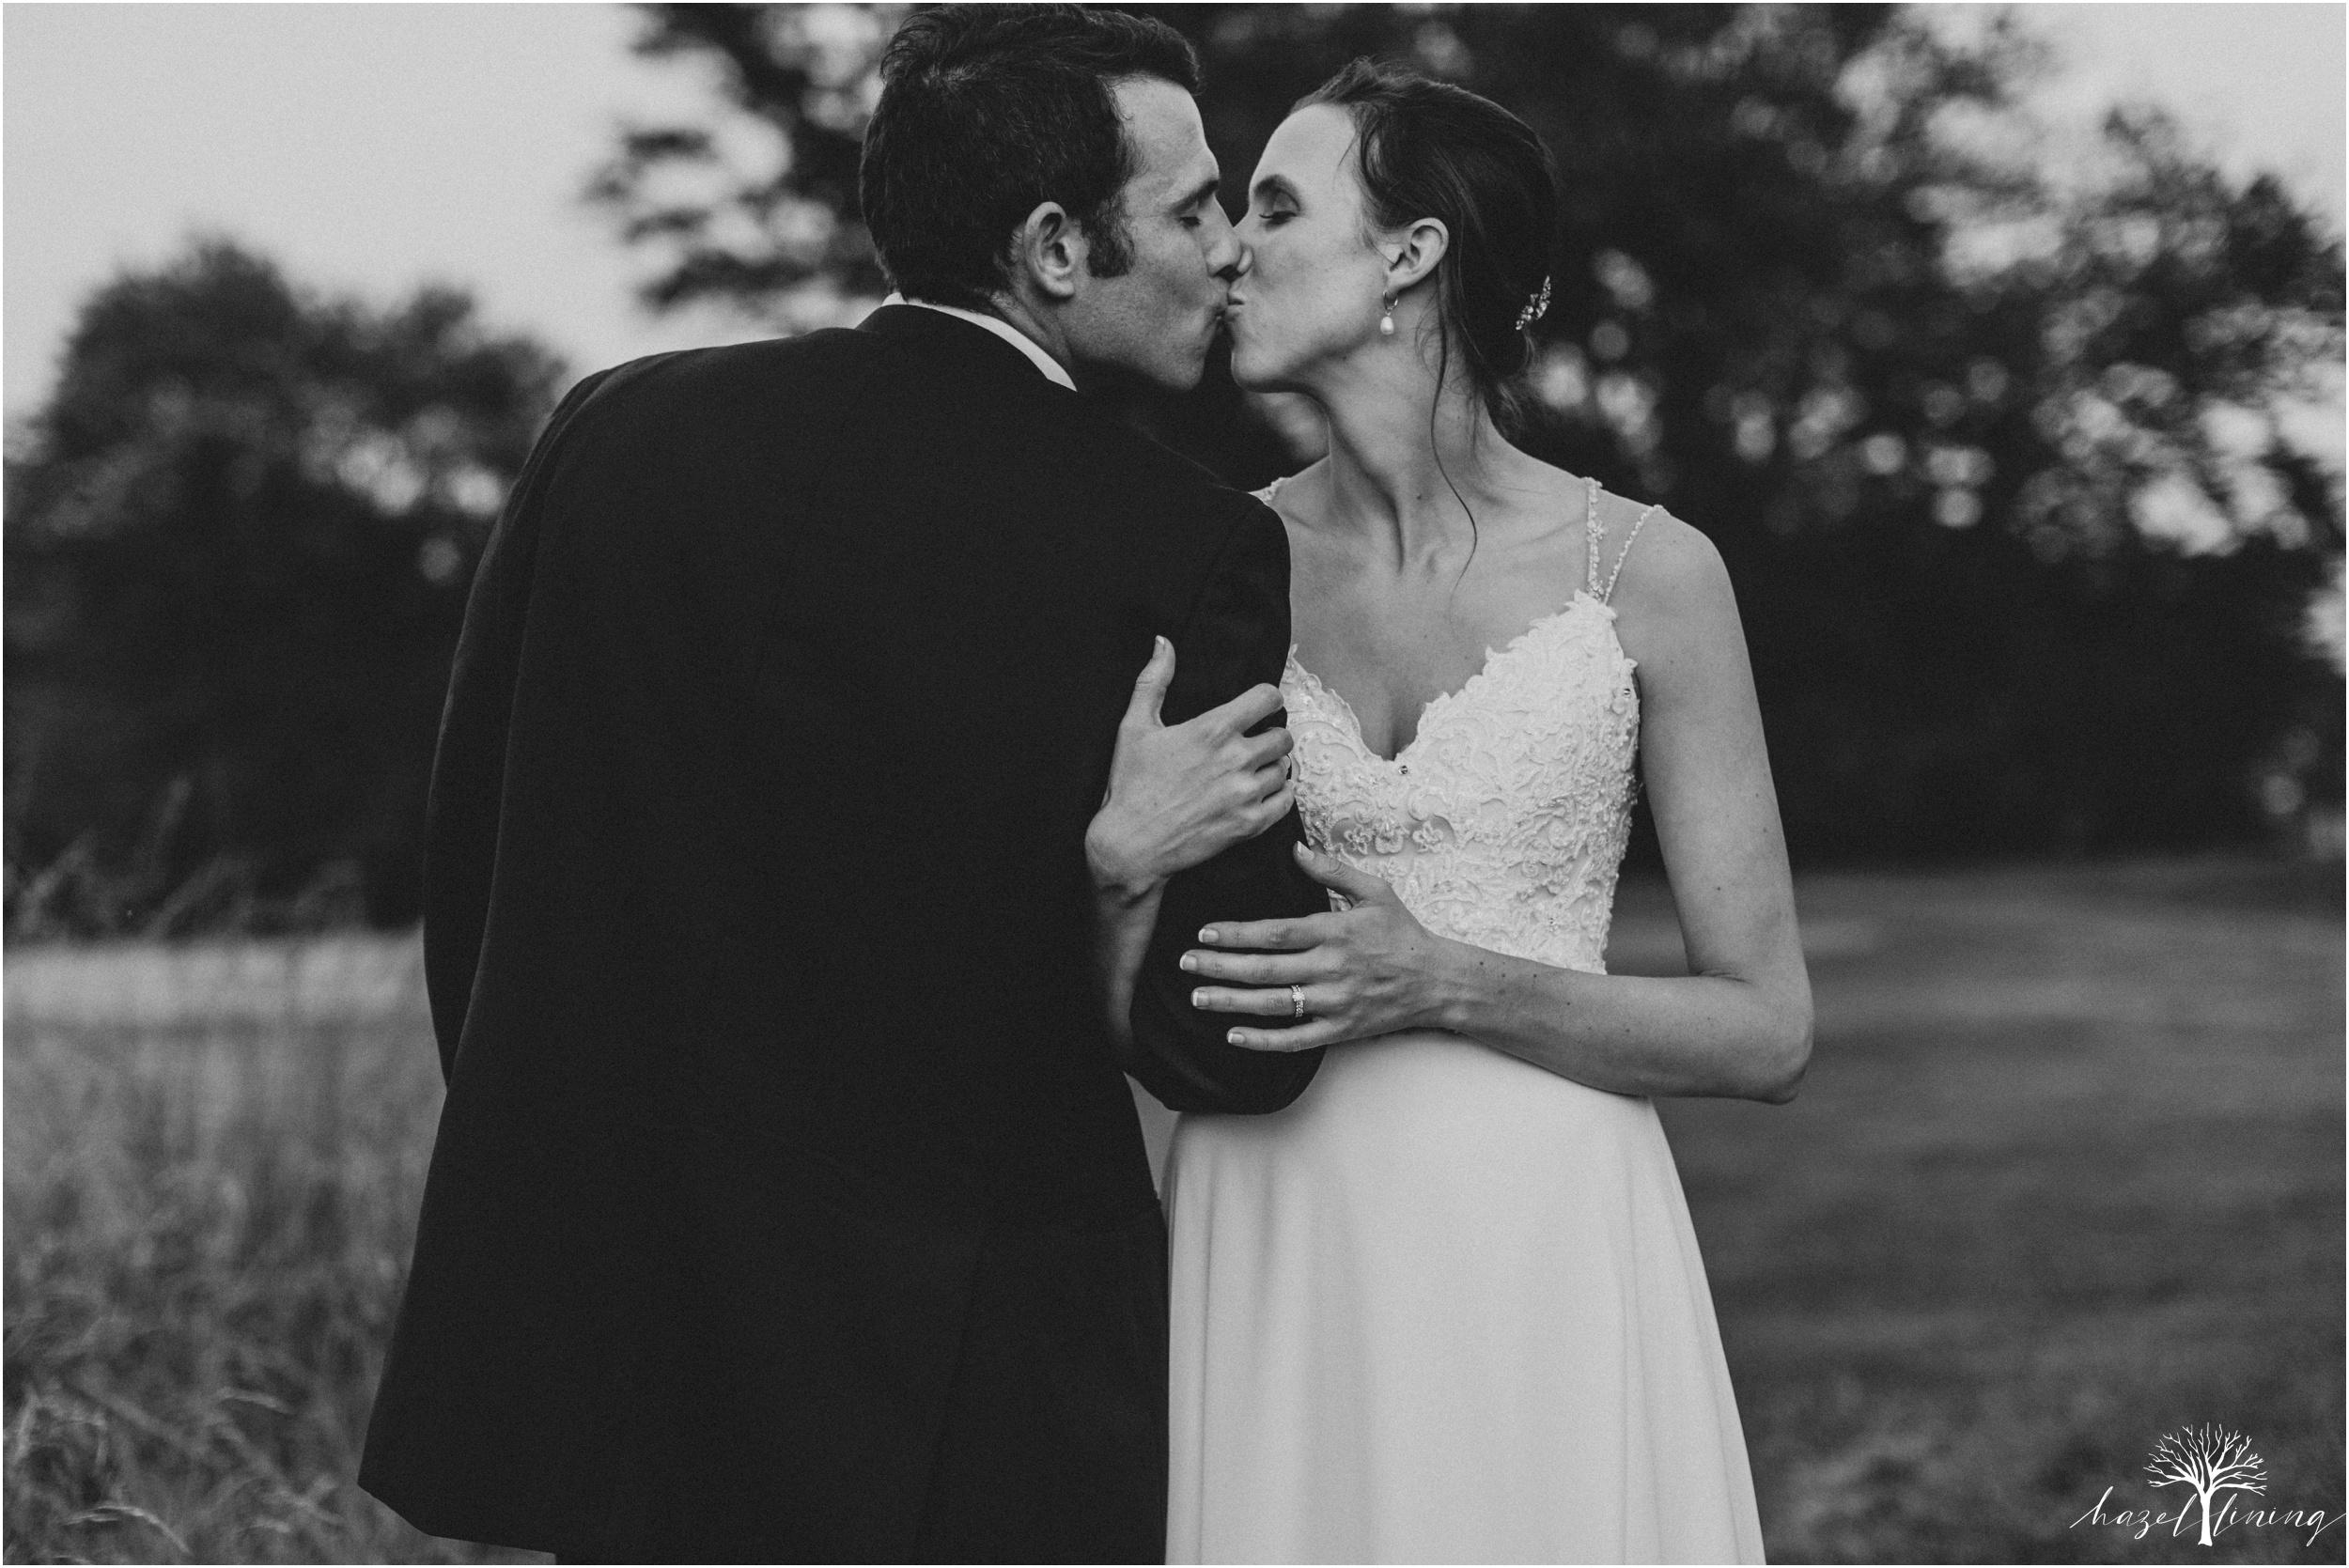 hazel-lining-travel-wedding-elopement-photography_0174.jpg